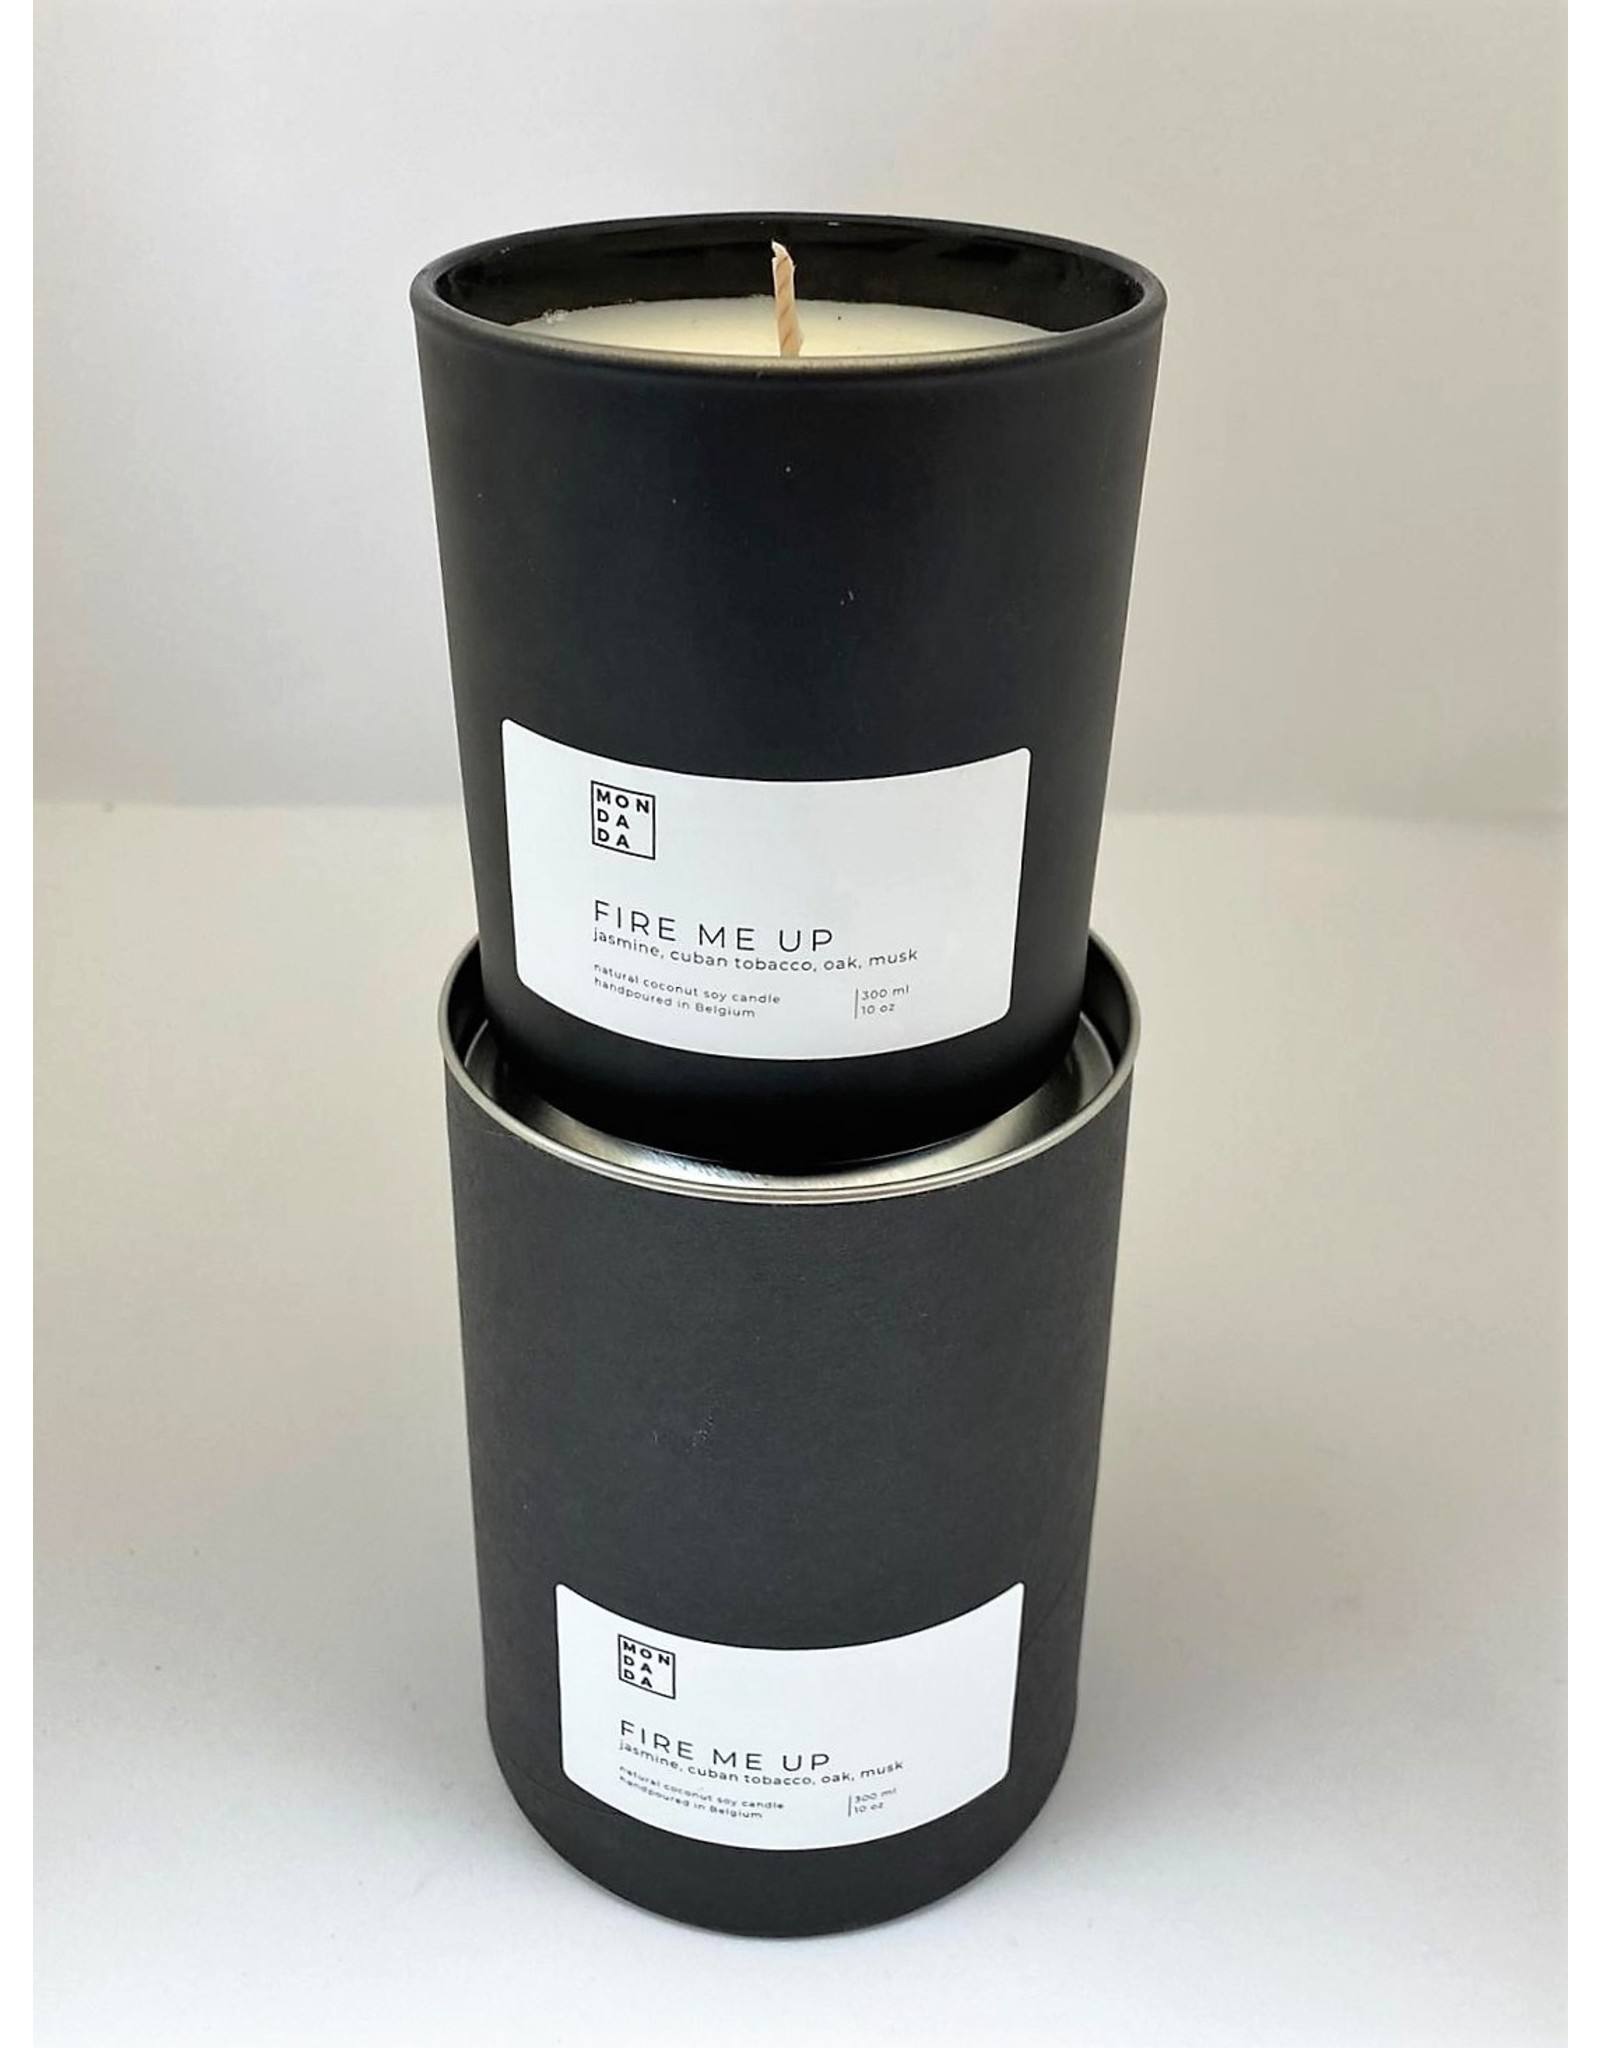 Mon Dada Black Candle - Down to Earth 300ml